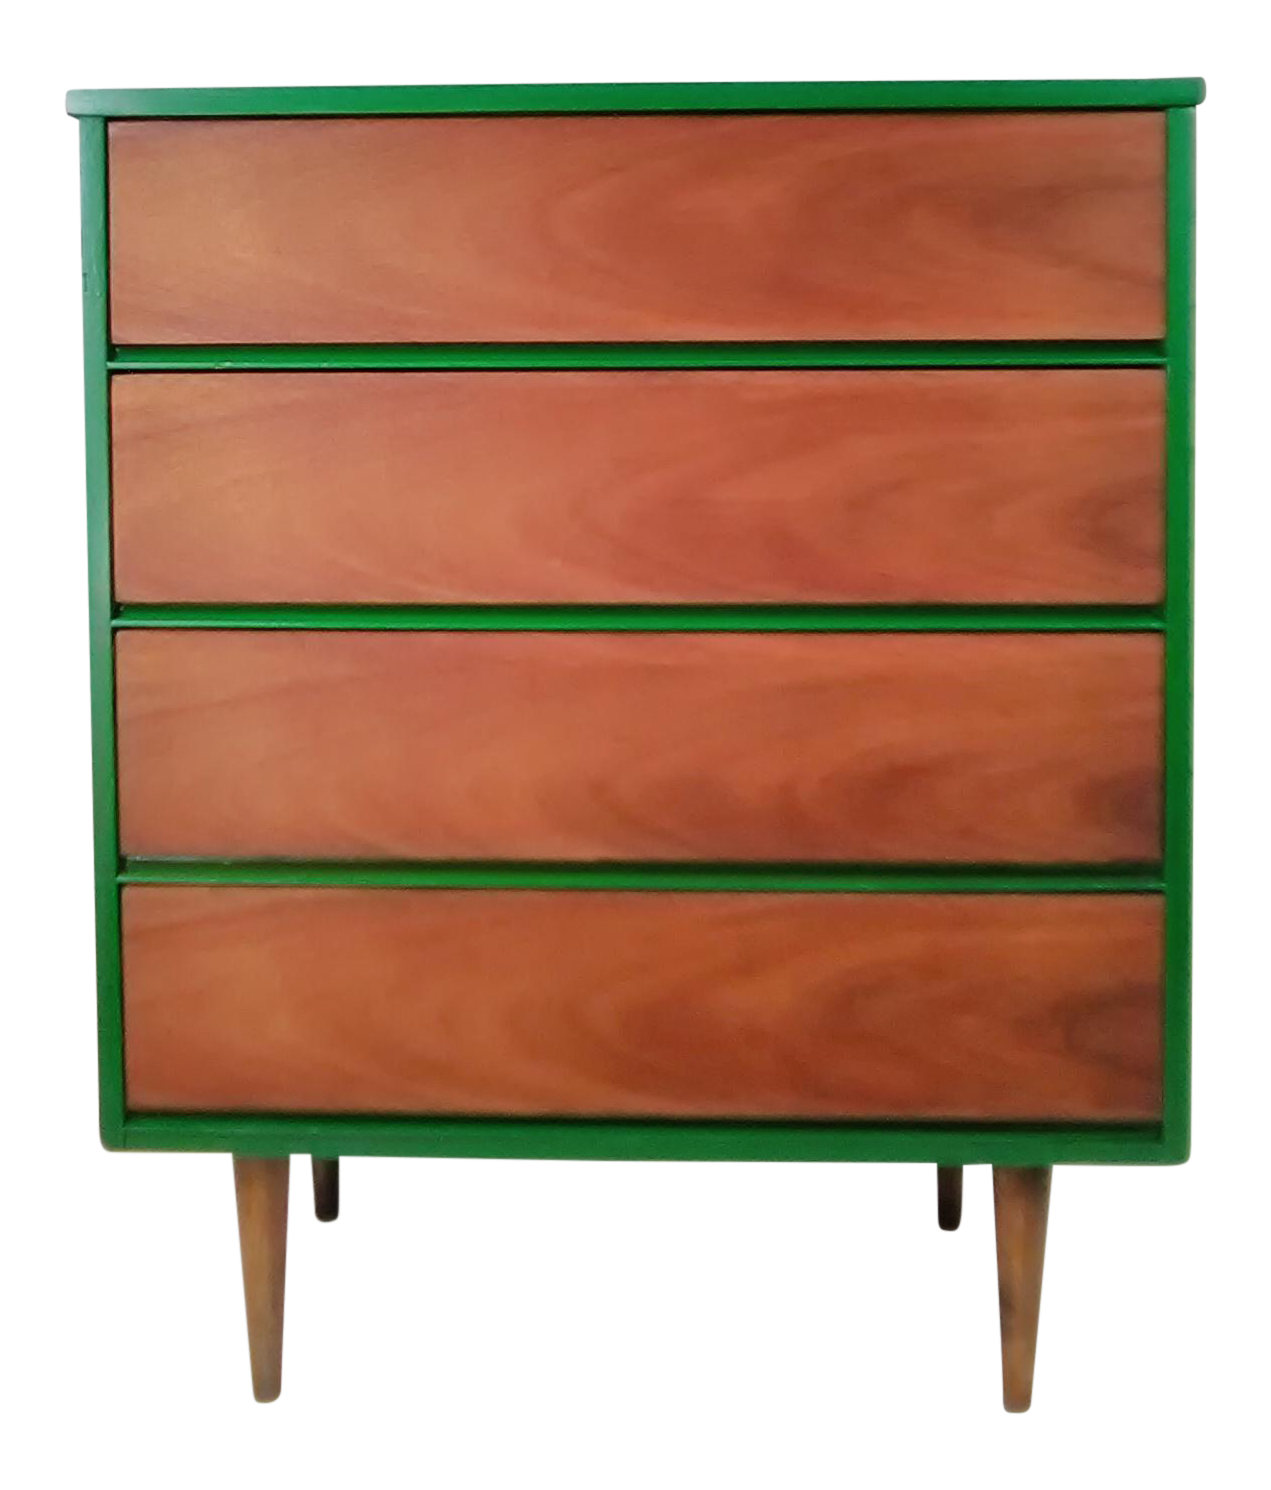 Mid Century Modern Dresser Green Dresser Modern Furniture Industrial  Bohemian Minimal Vintage Retro Mid Century